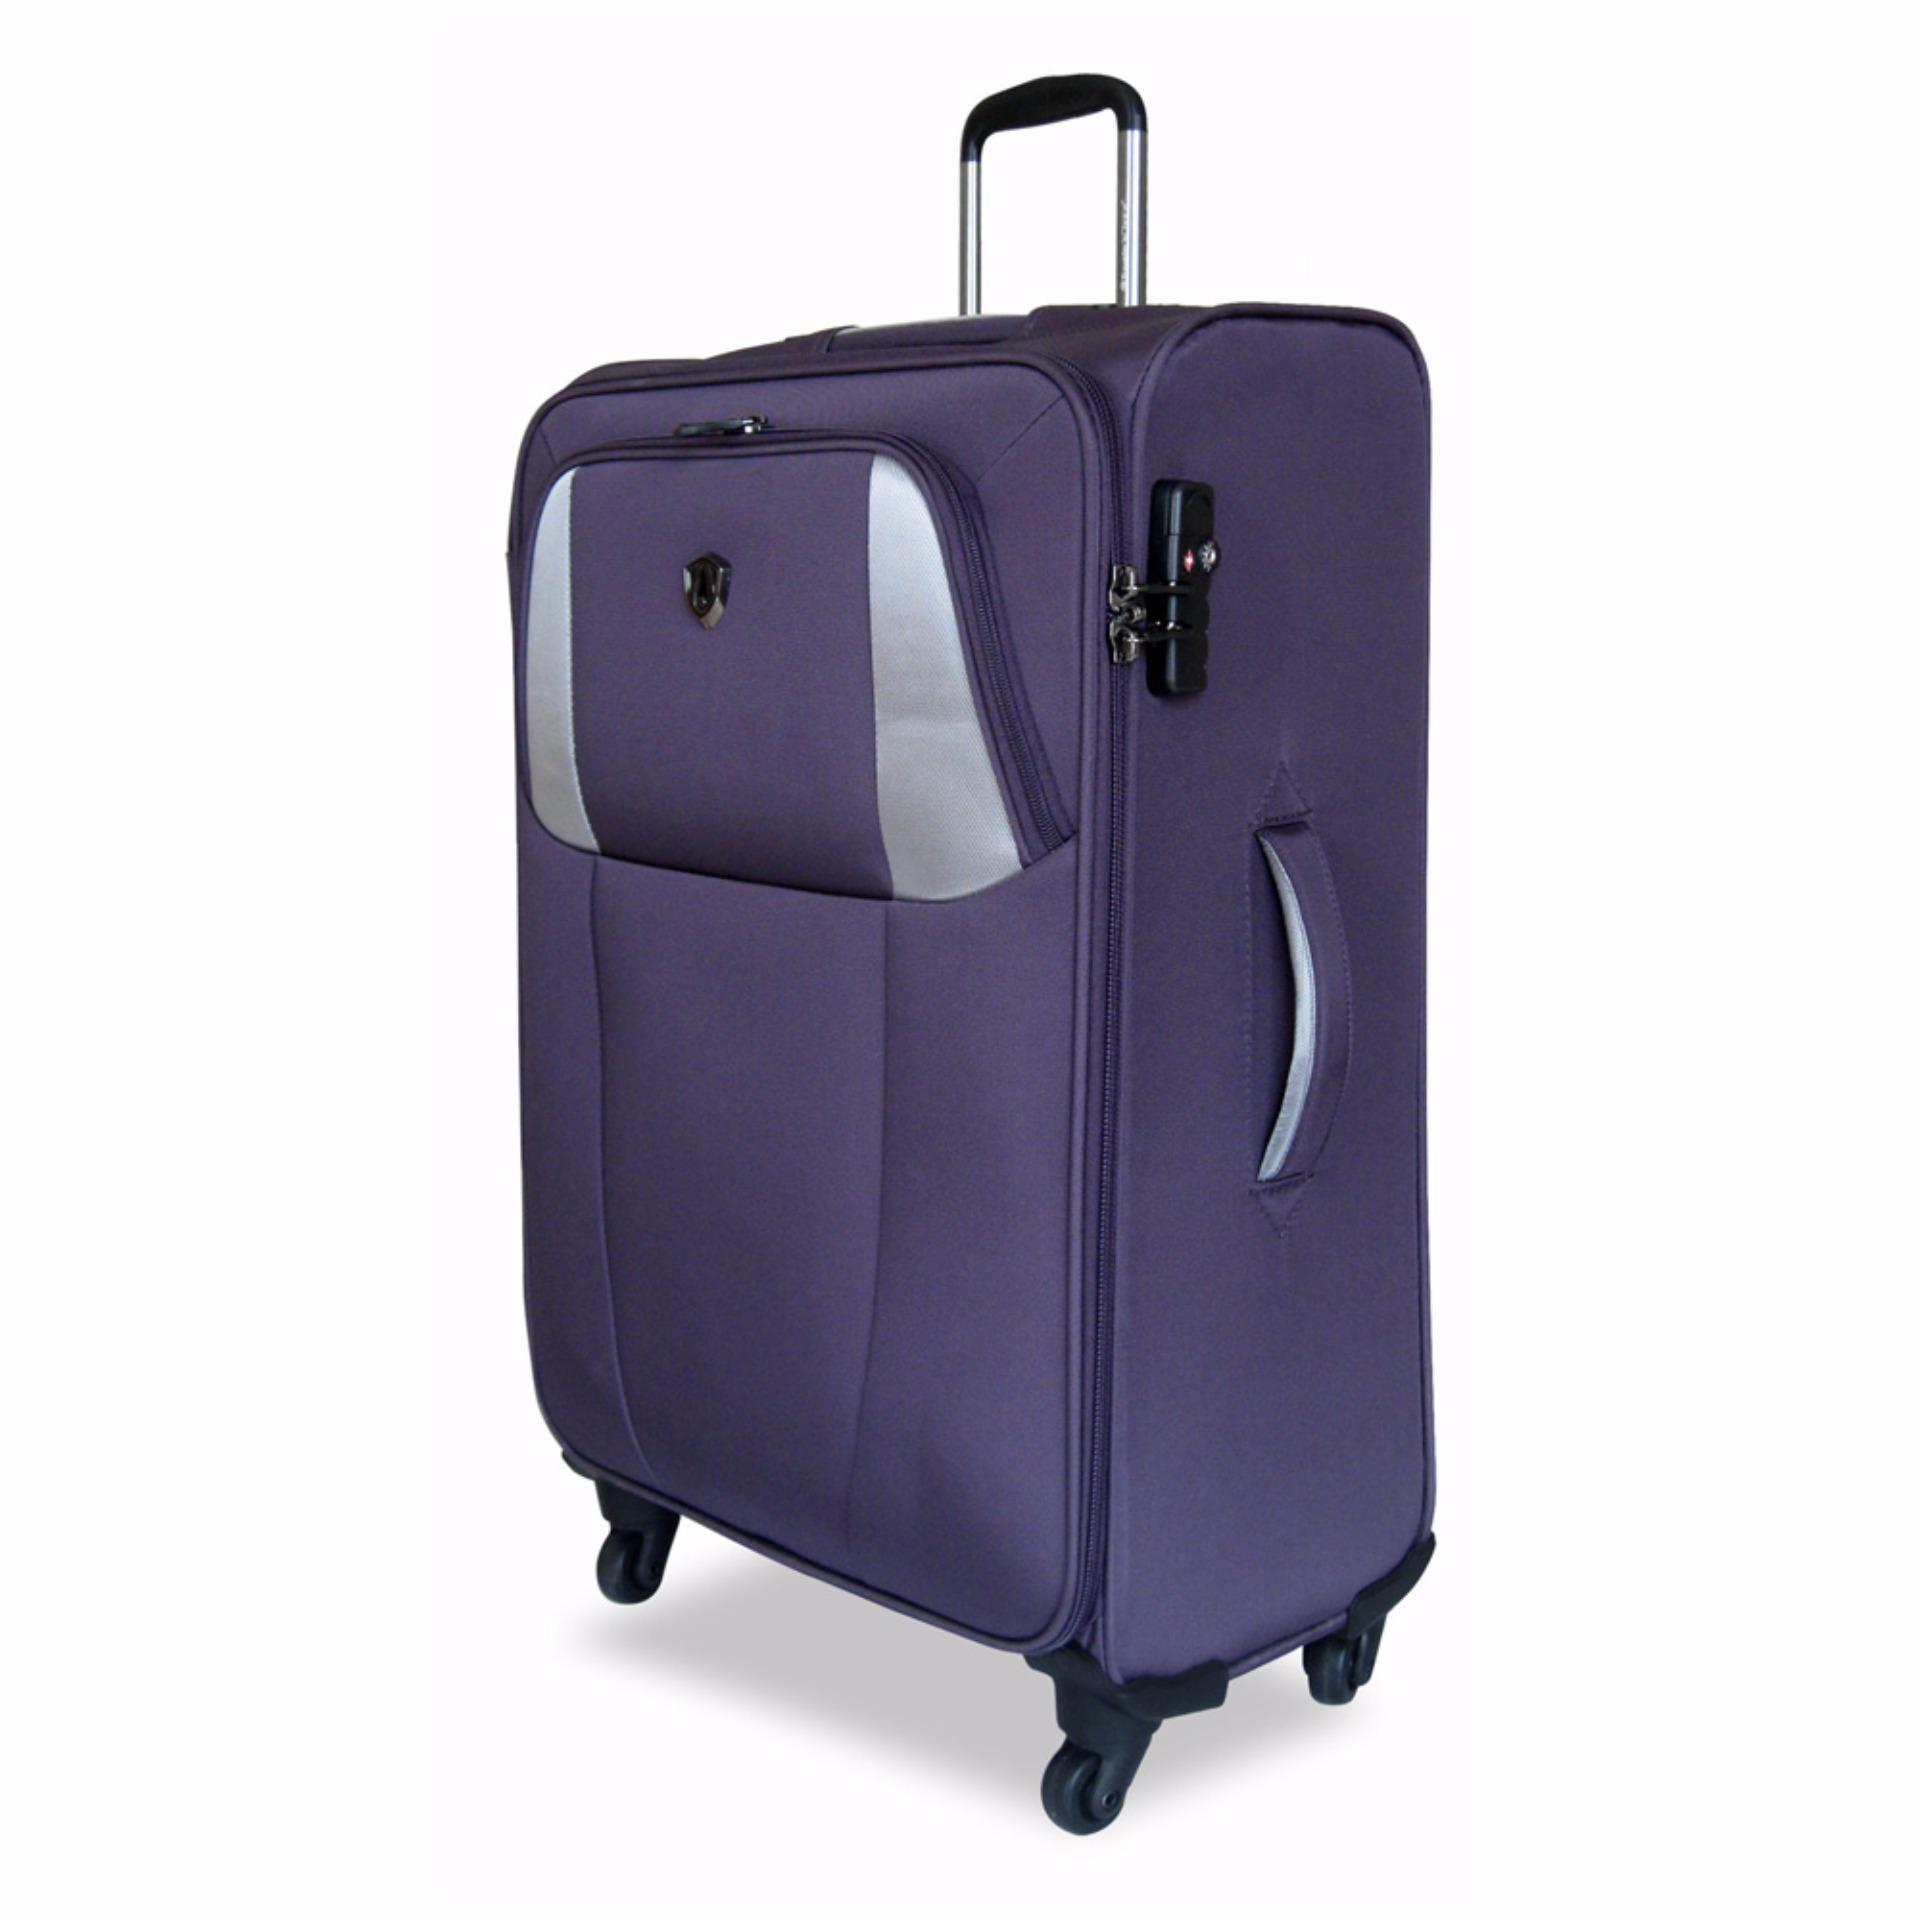 Spesifikasi Traveler S Choice Forsa Us Softcase Large 31 Inch Purple Lengkap Dengan Harga